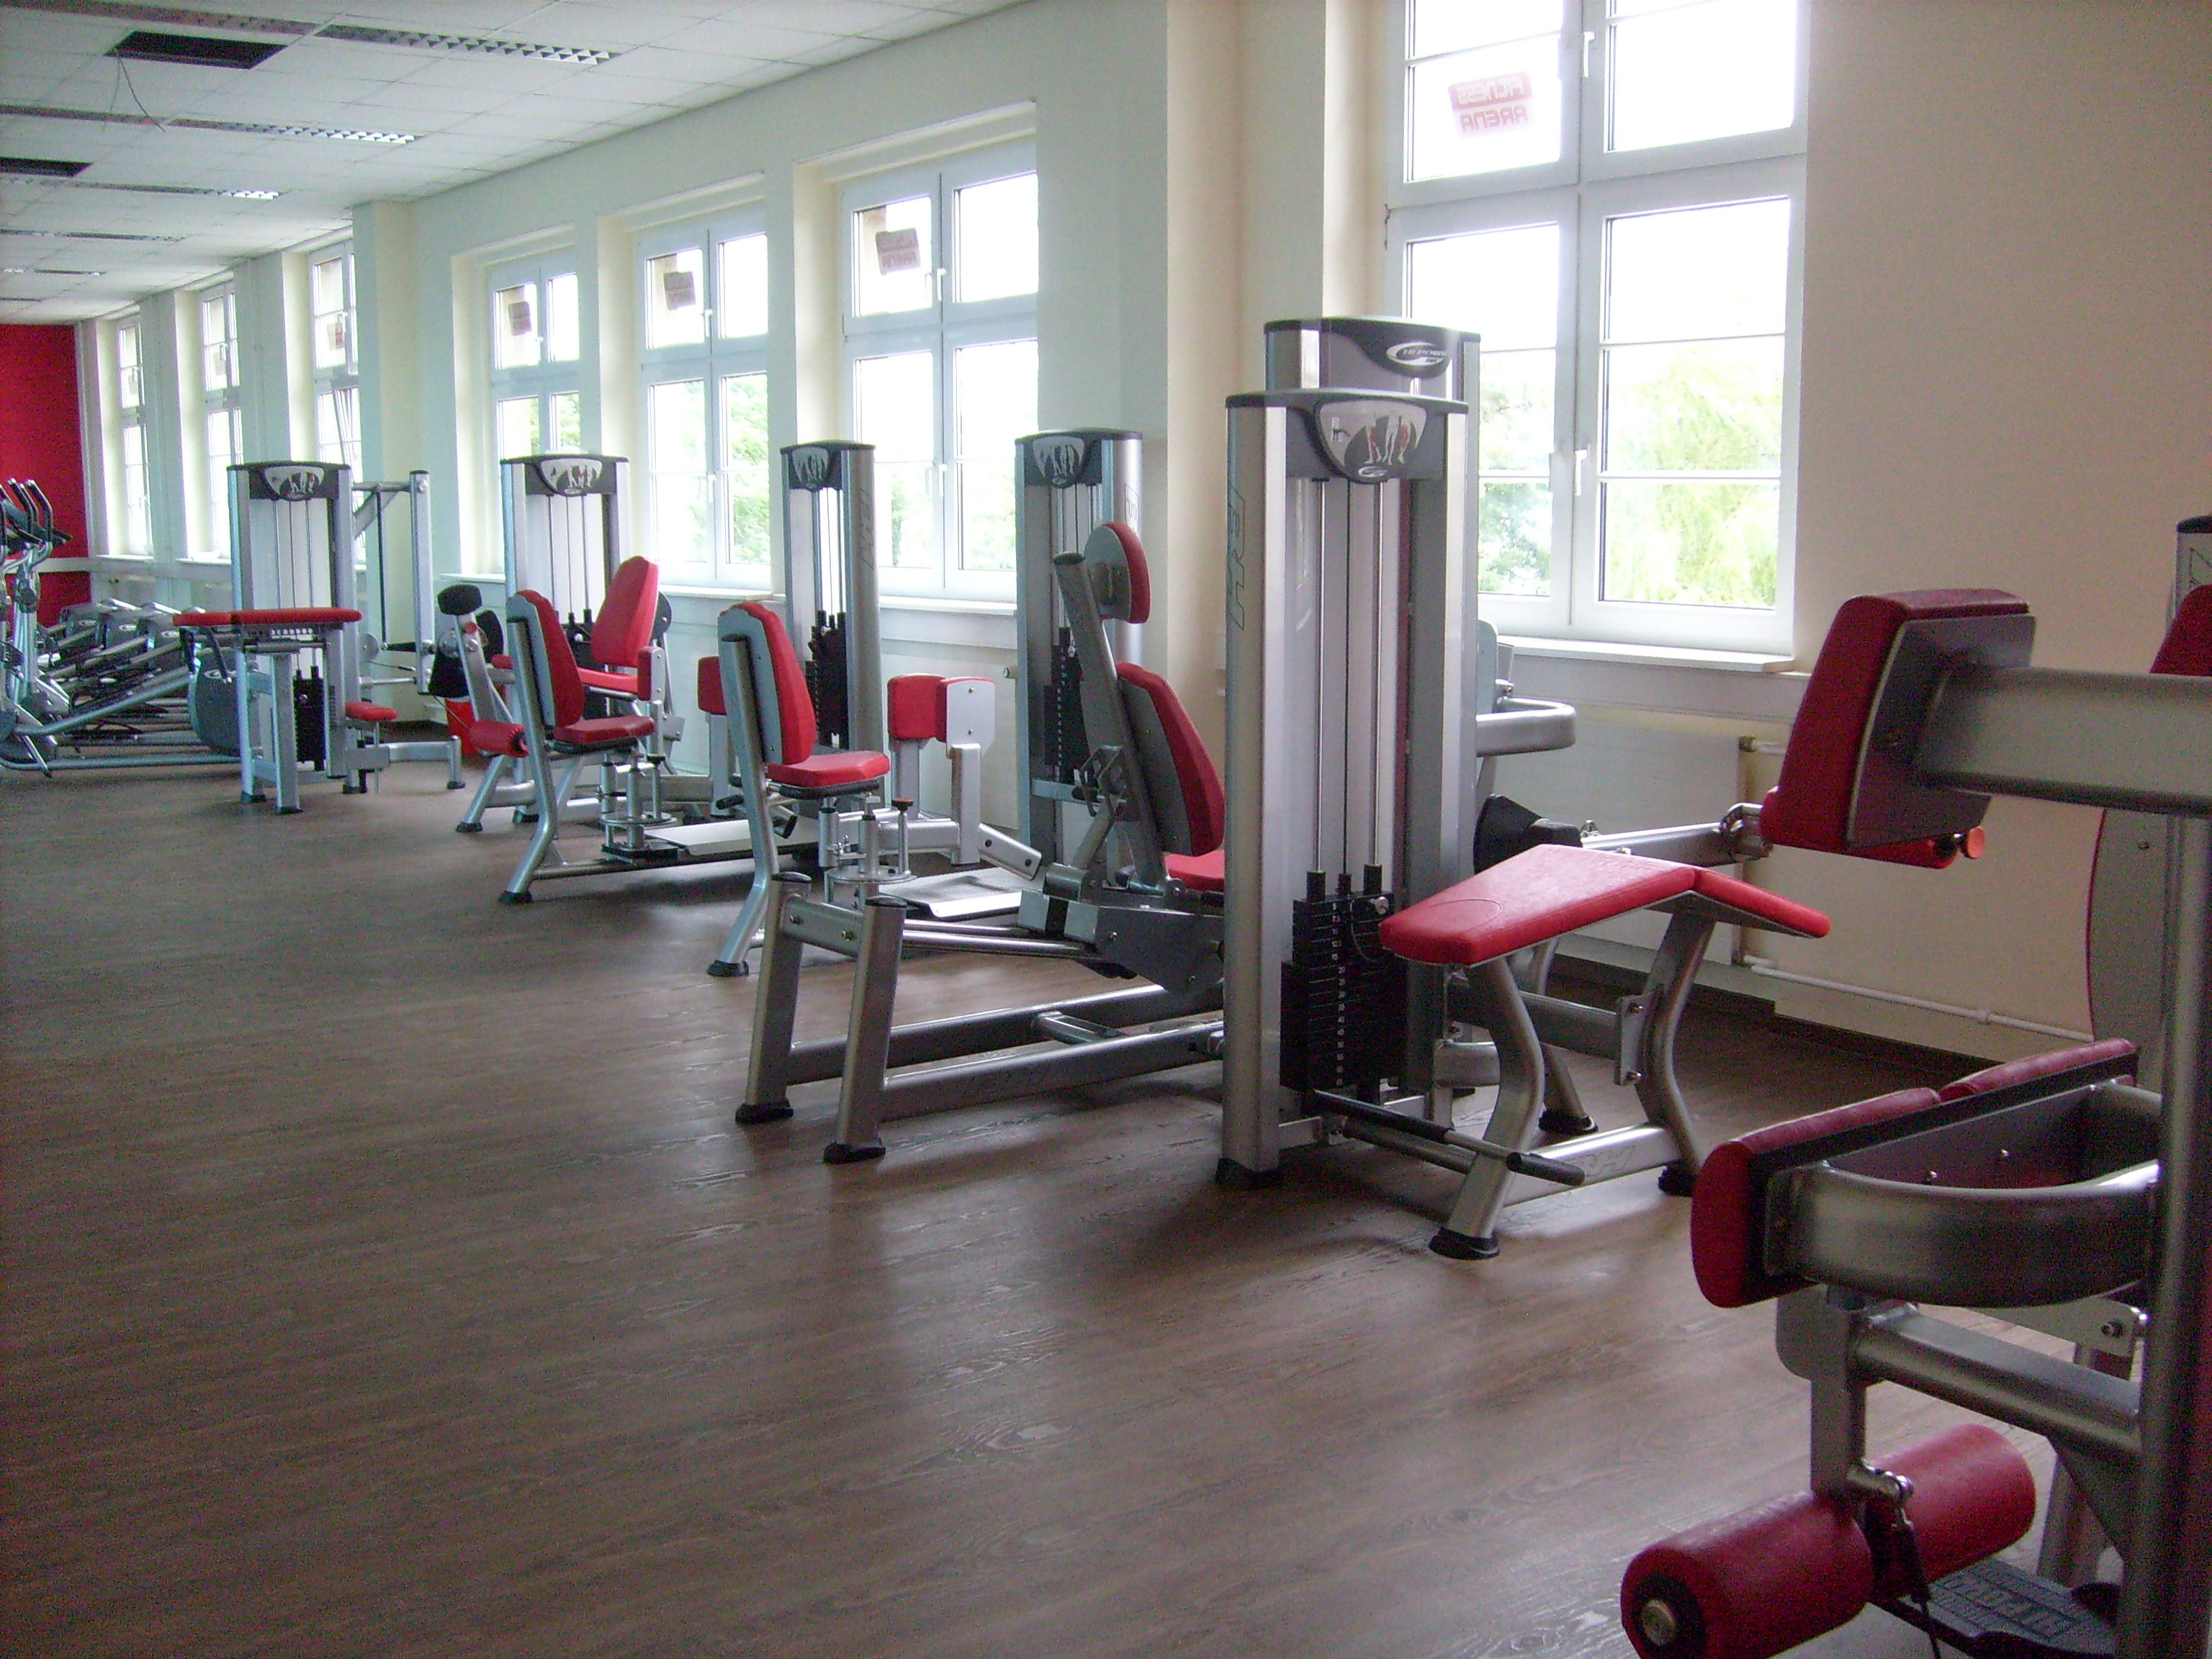 Fitnessstudio Einrichtung sonsportgeraeteshop de komplettes fitness studio